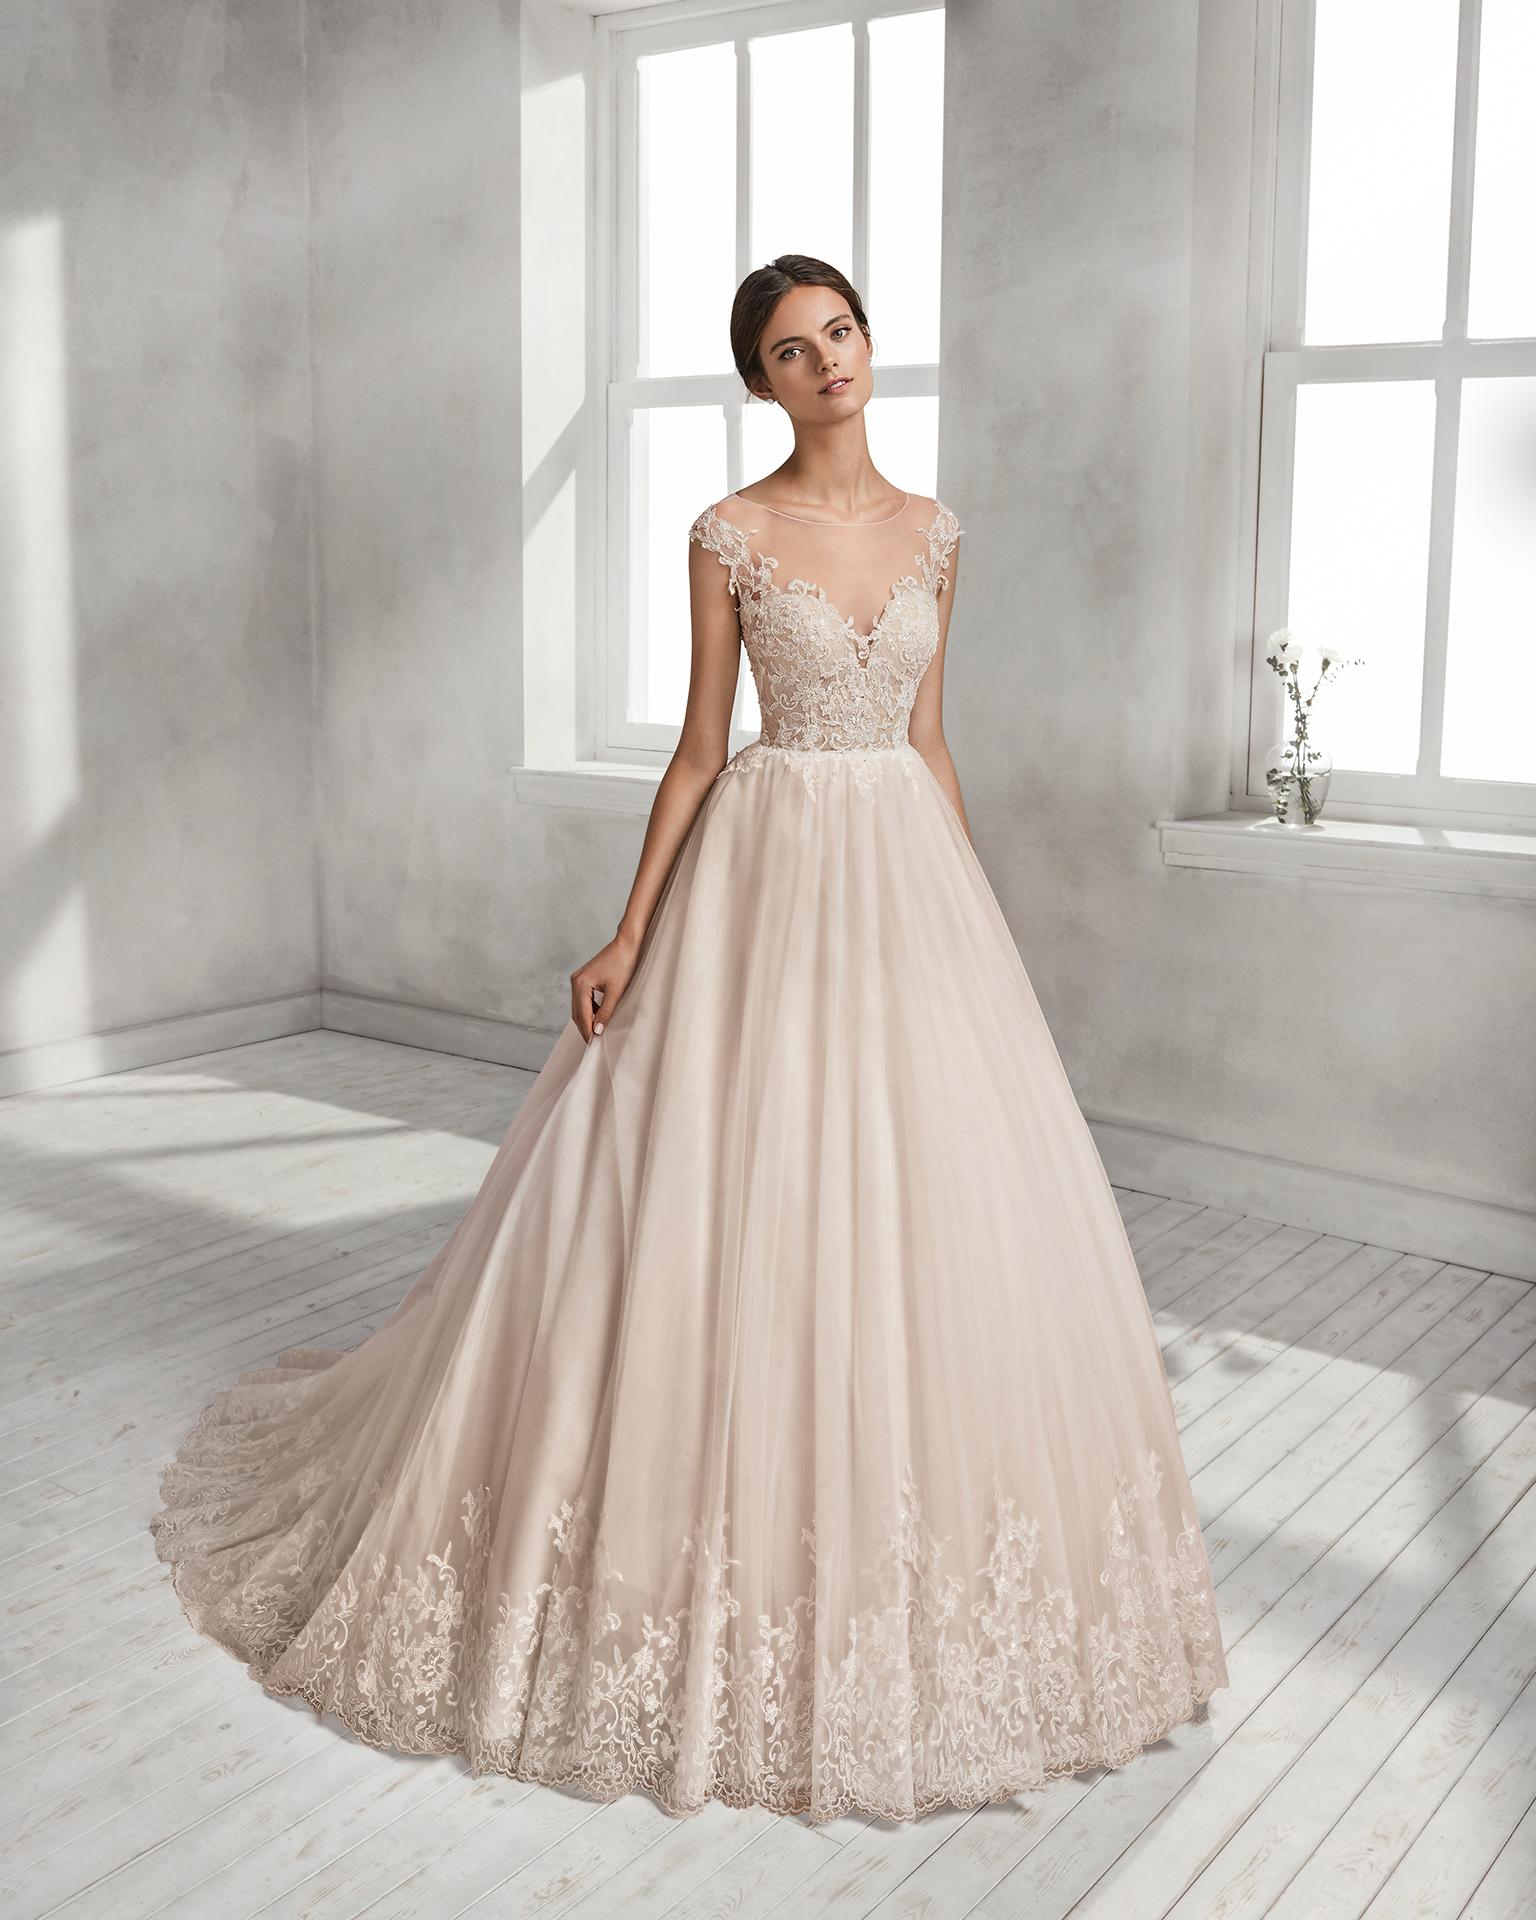 HELOIS - Bridal 2018. Luna Novias Collection